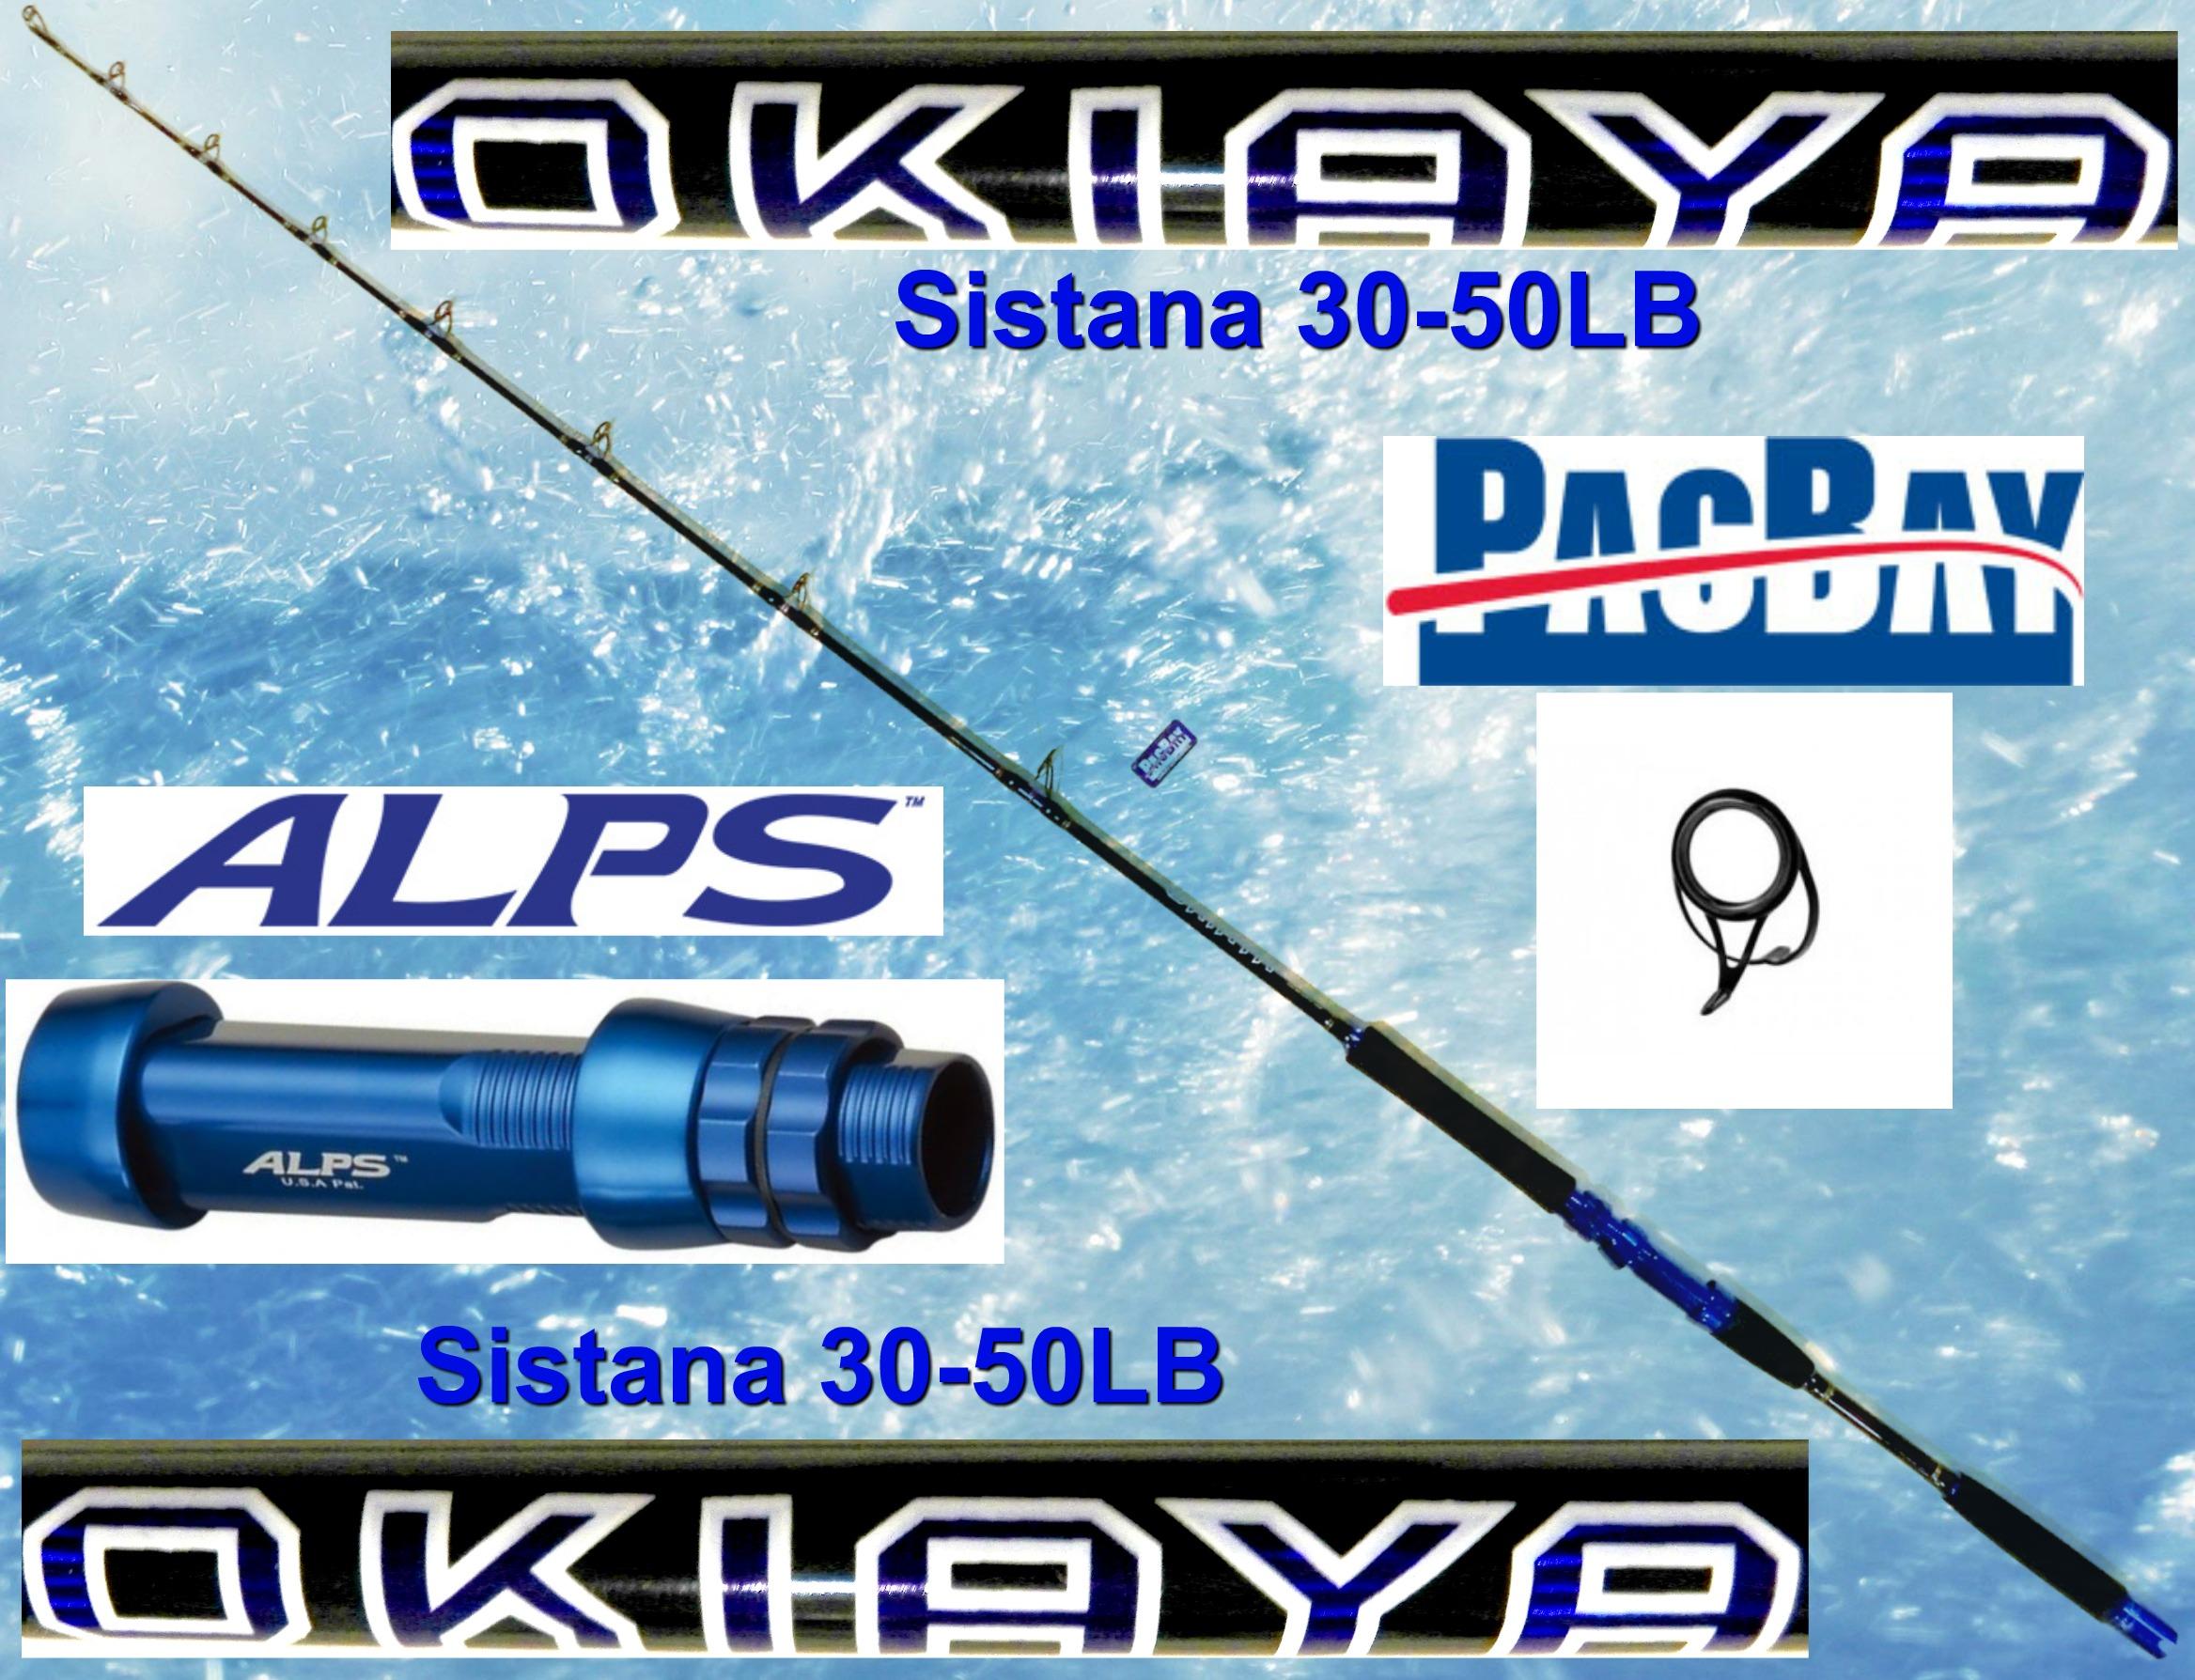 Rods | Okiaya Fishing Rods | Big Game Fishing Equipment